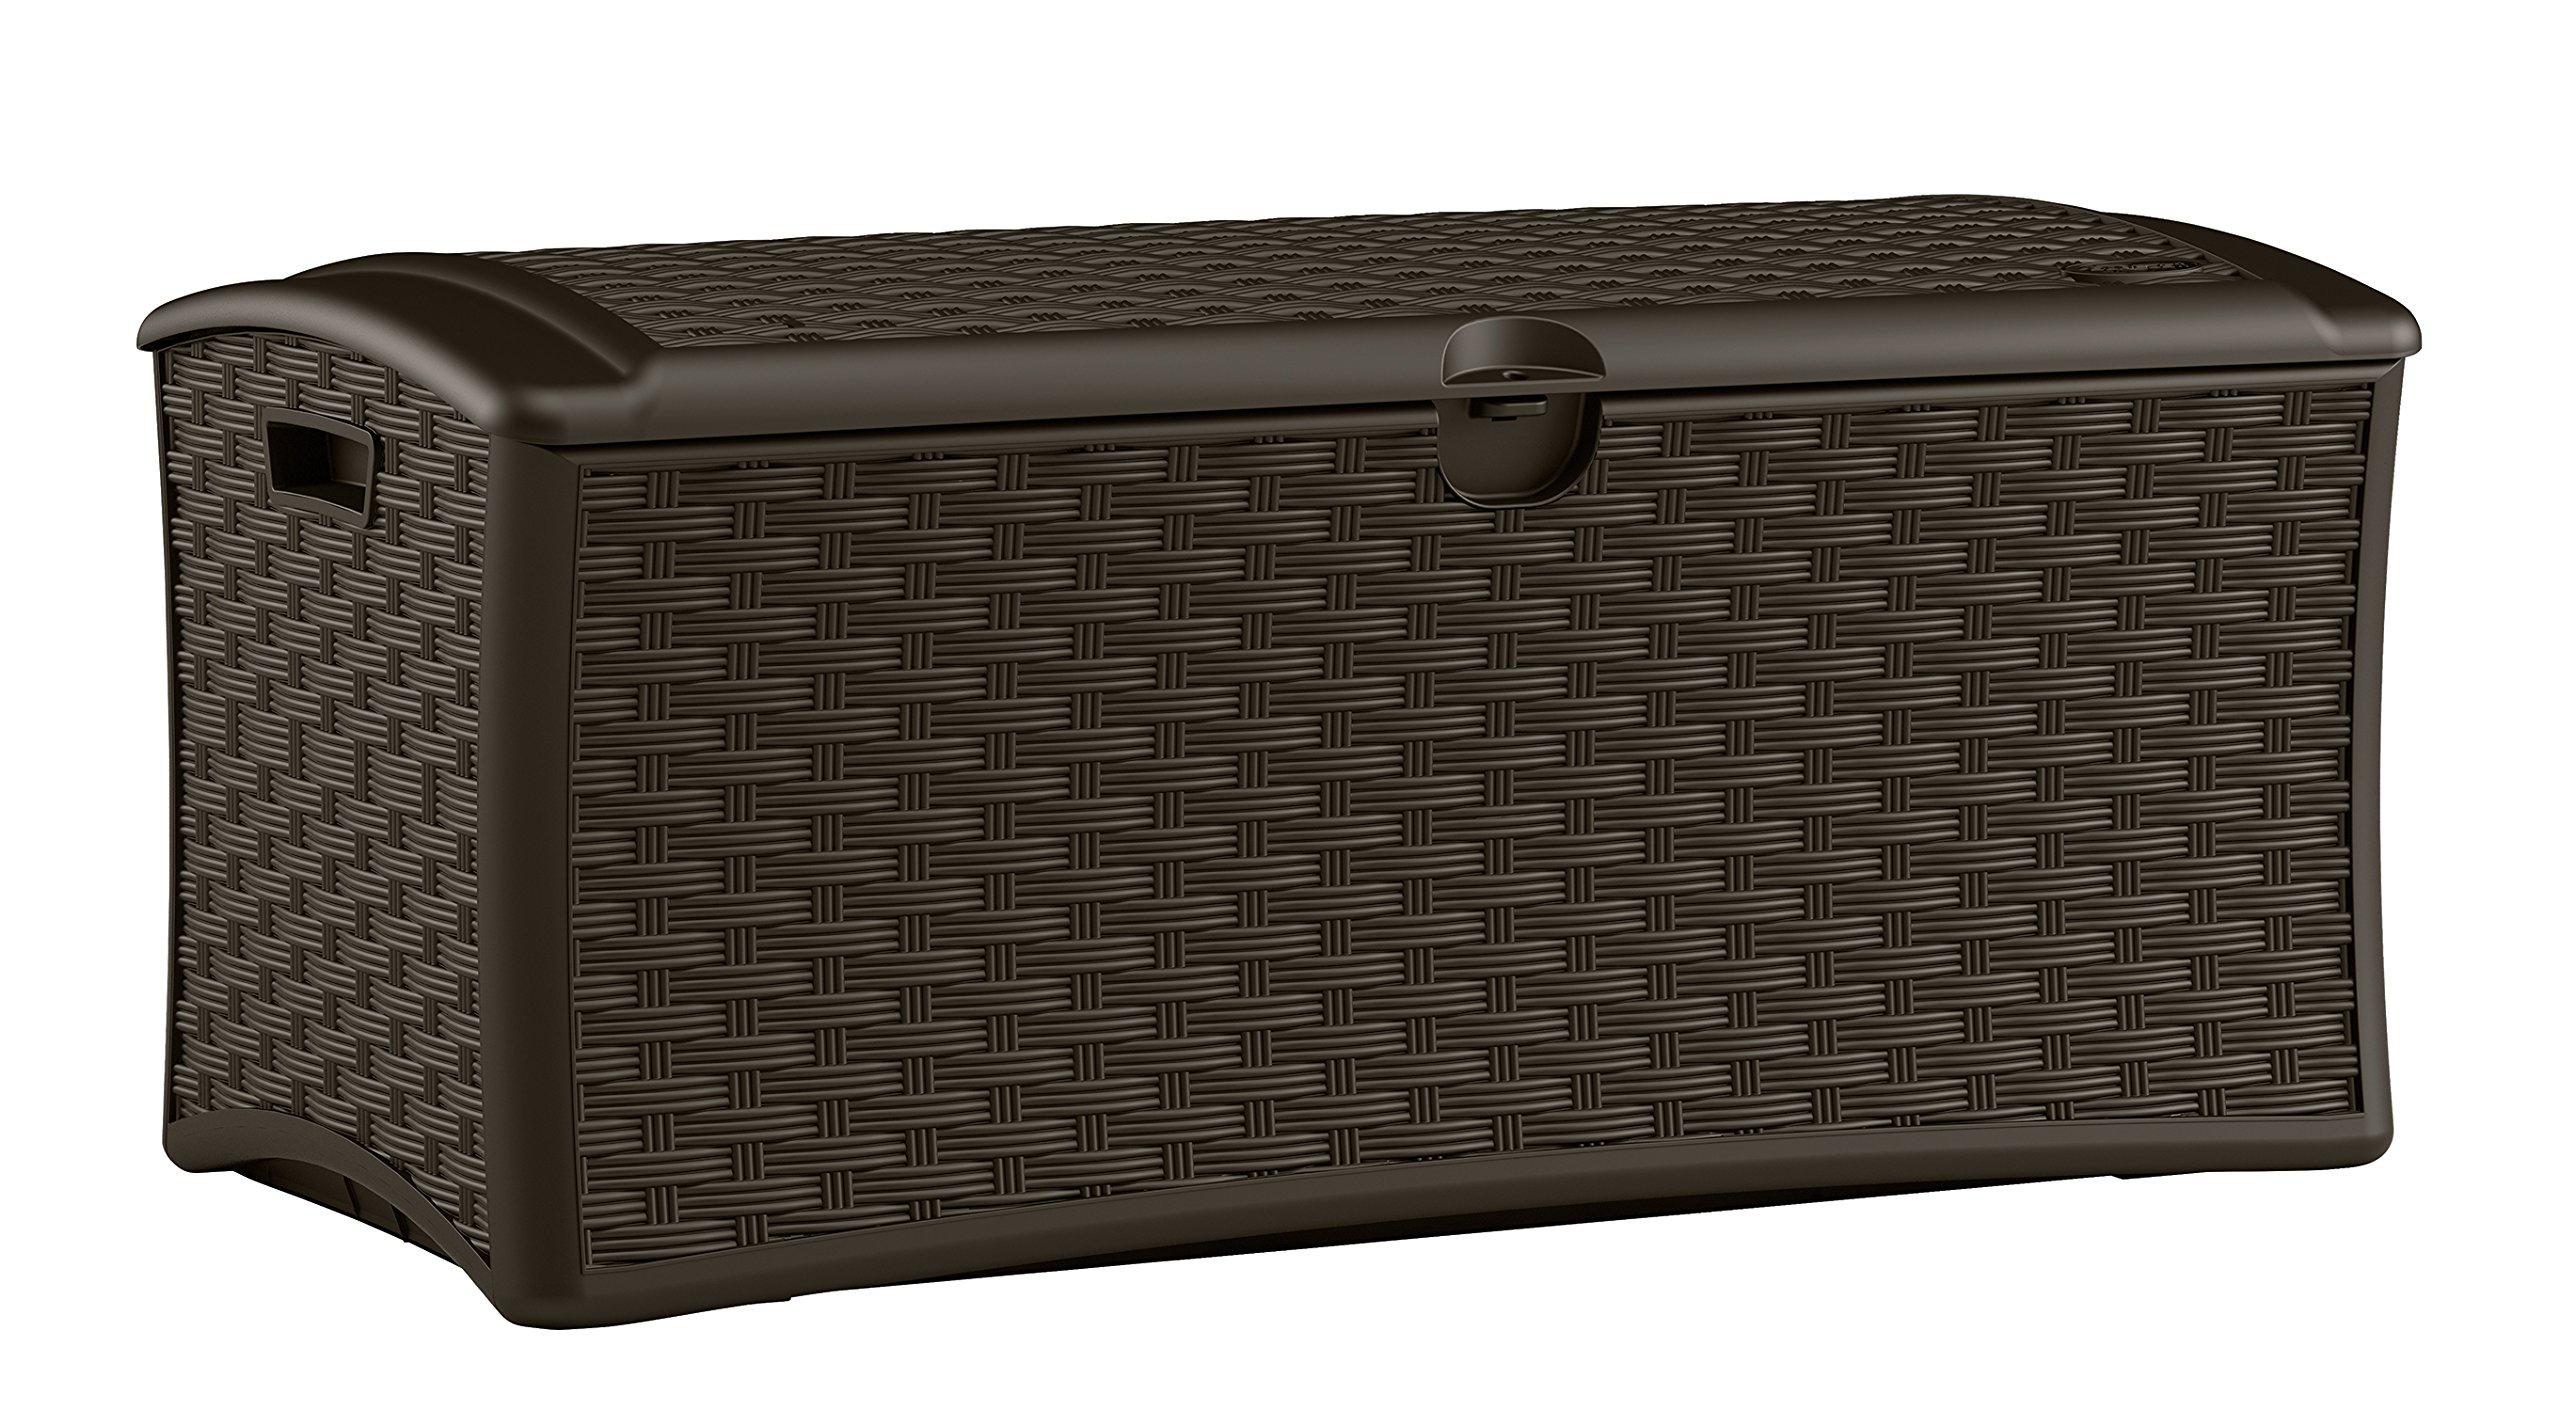 Suncast DBW7000 Resin Wicker Deck Box, 72 gallon